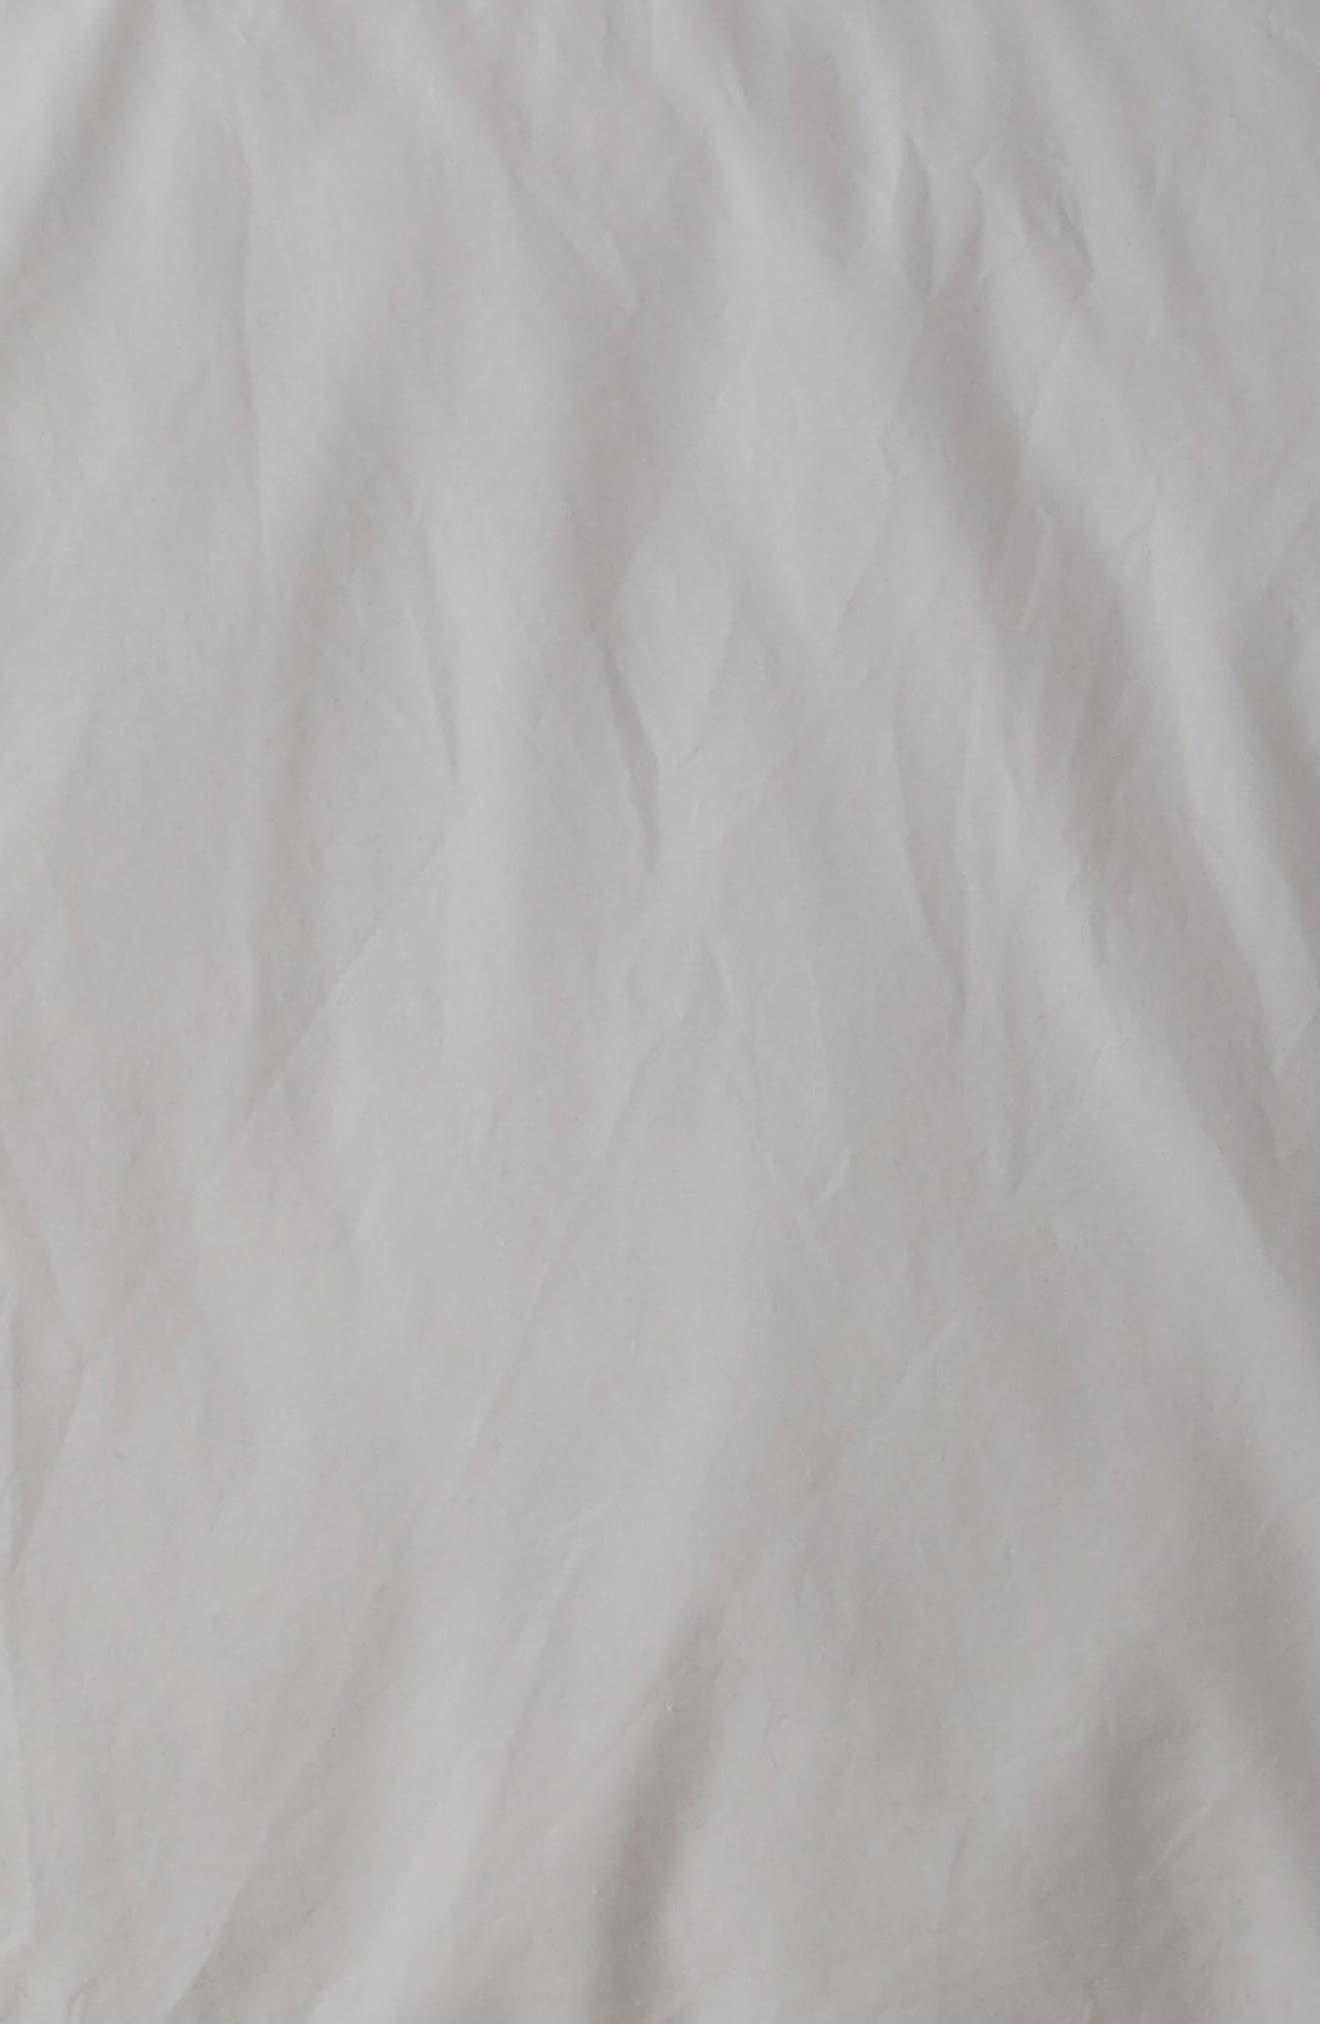 Alternate Image 2  - Pom Pom at Home Parker Cotton Duvet Cover & Sham Set